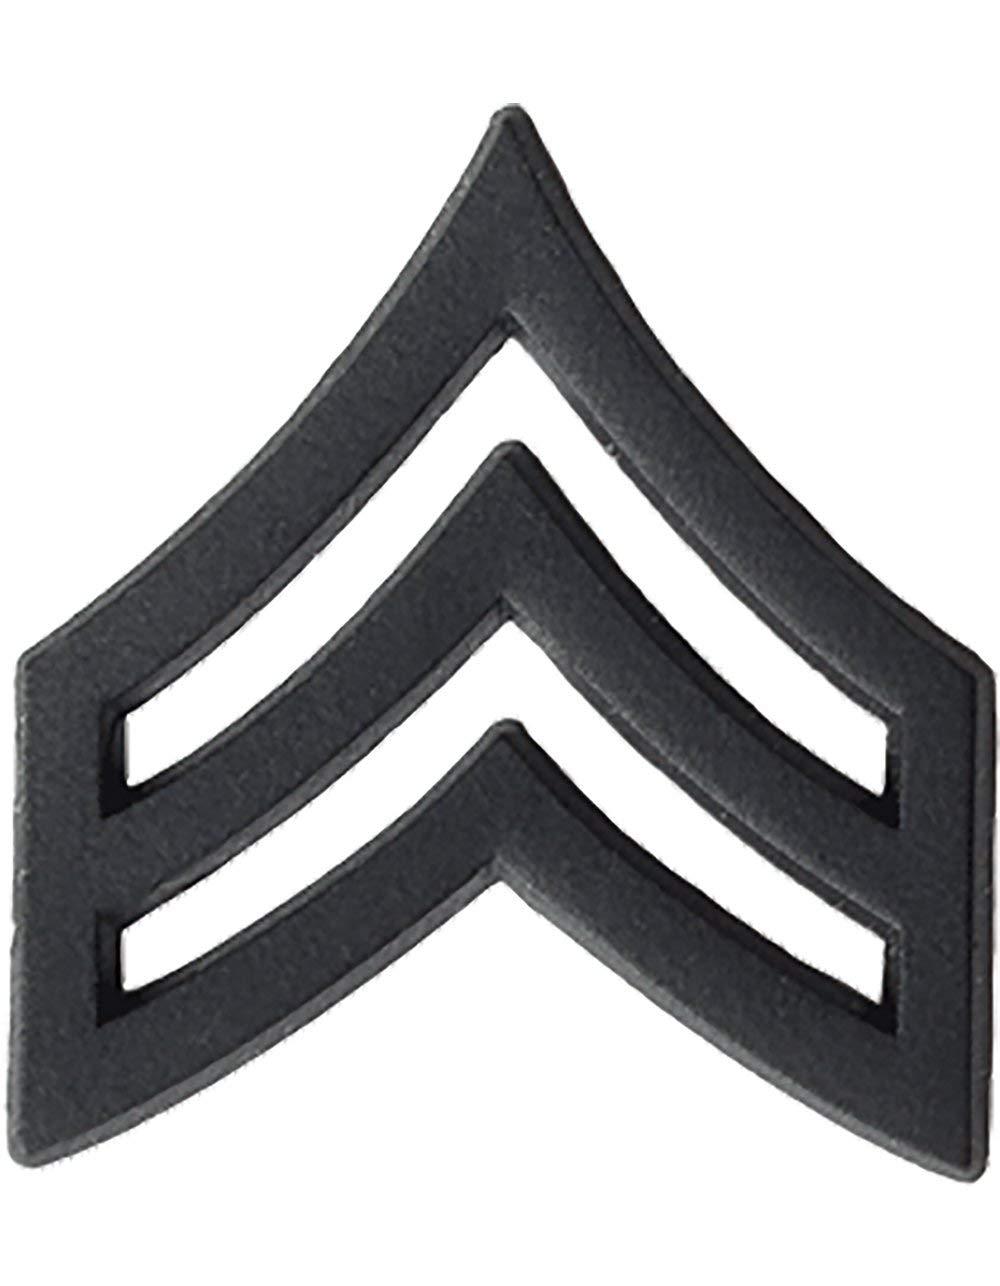 1 PAIR U.S Army Metal Pin On Enlisted Rank BLACK